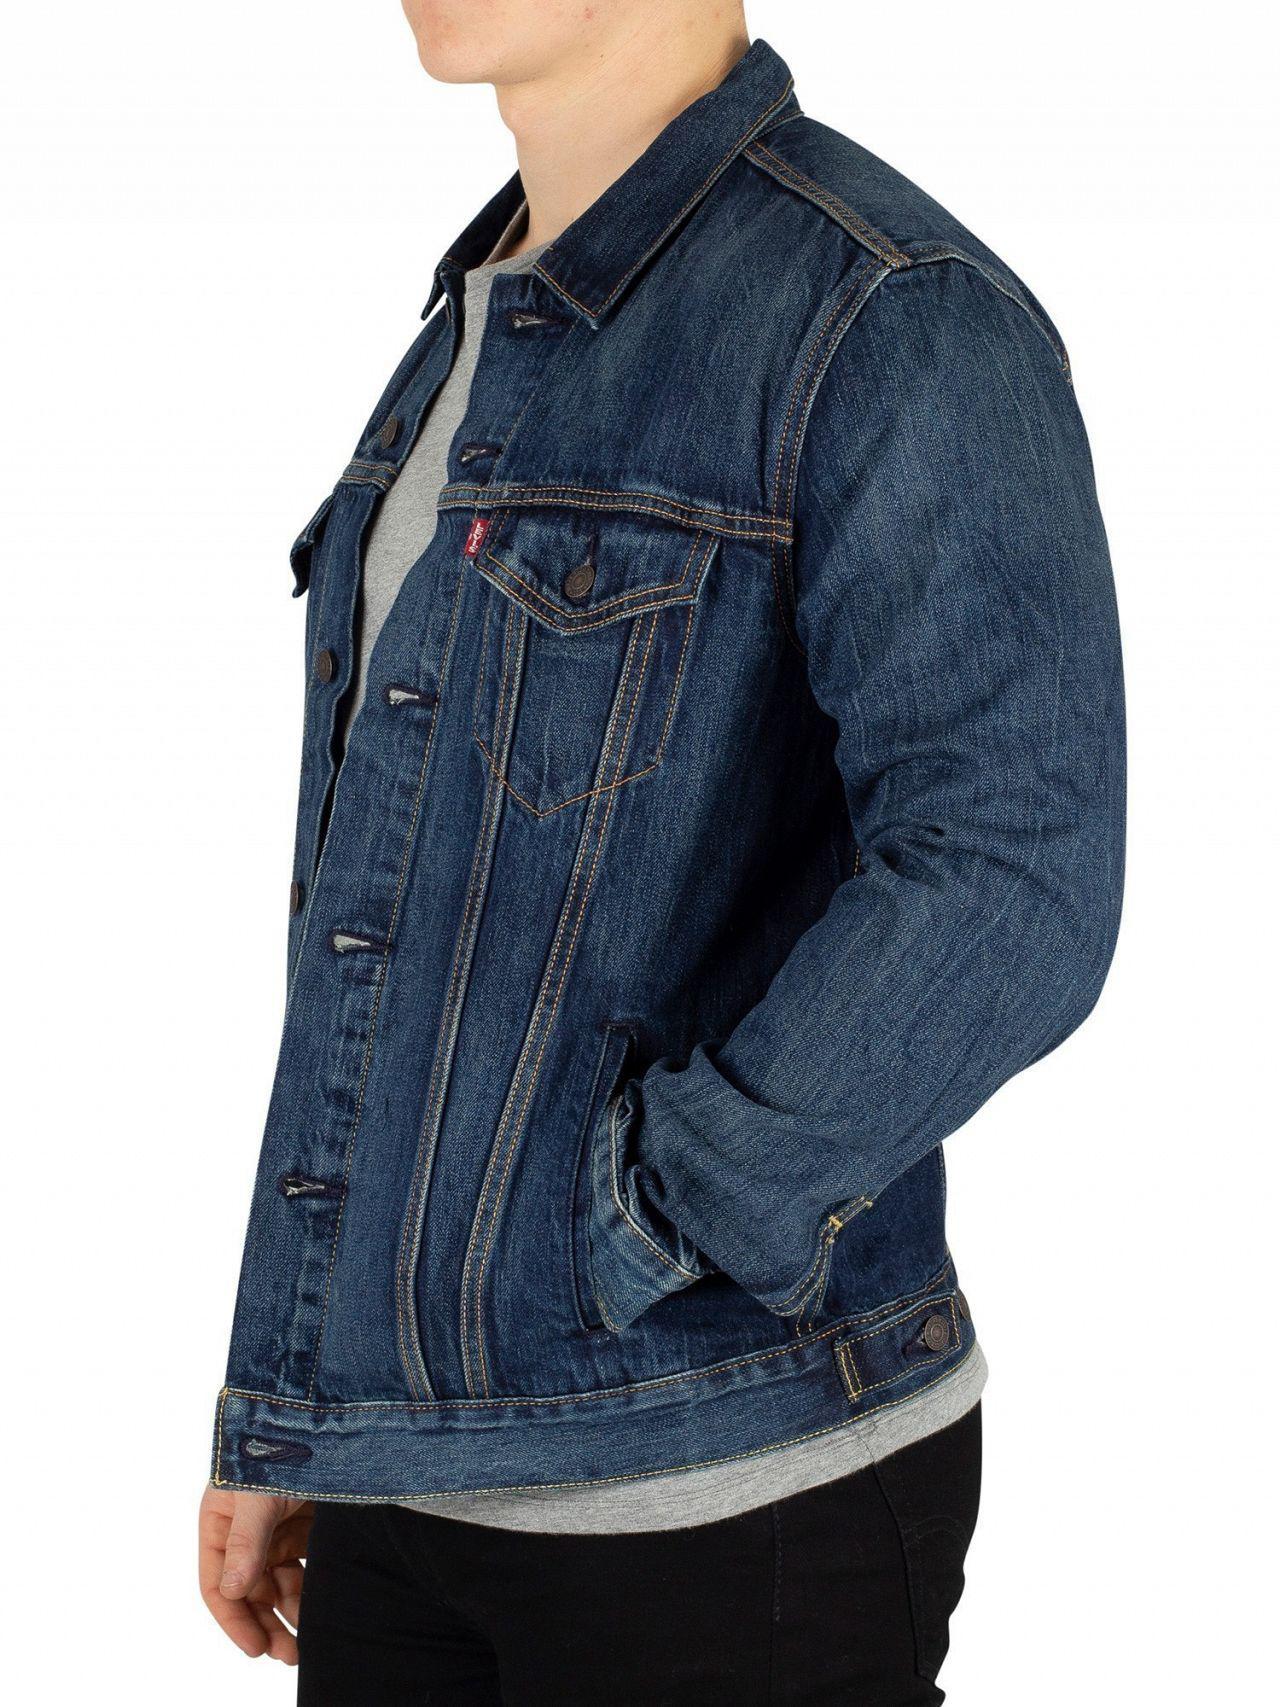 Lyst - Levi s Palmer The Trucker Jacket in Blue for Men ed7ce182777